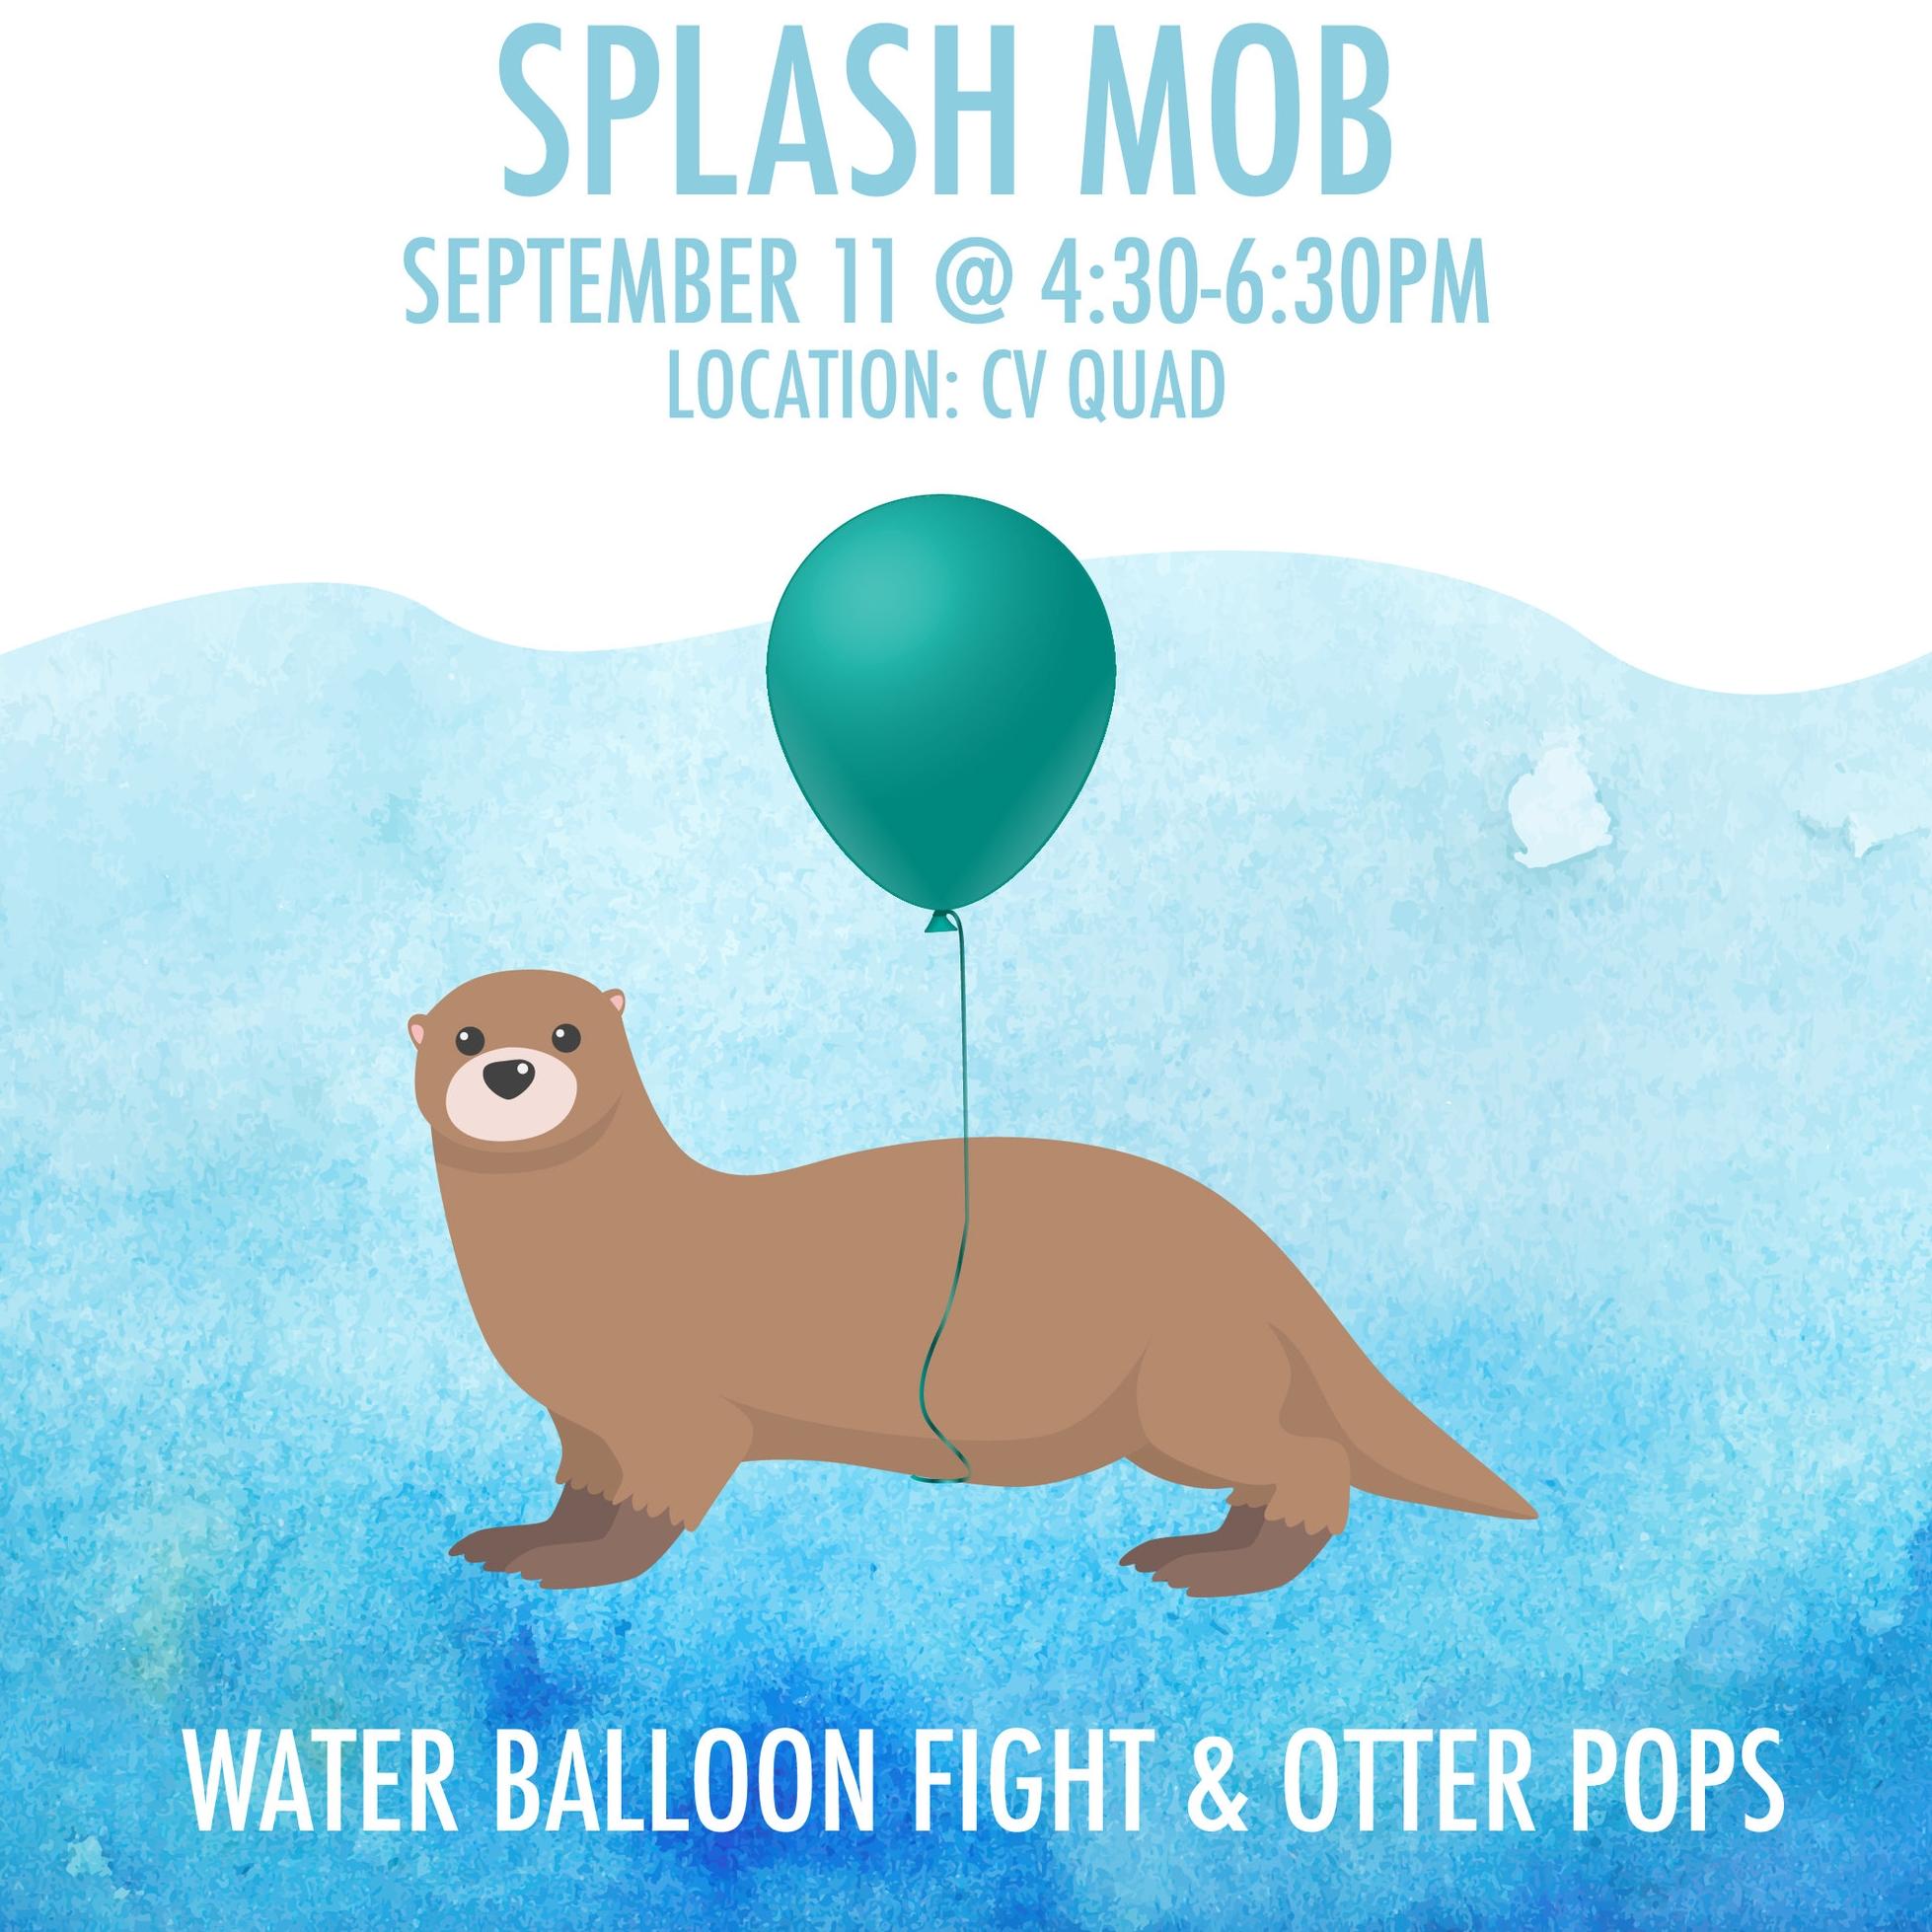 splash mob.jpg